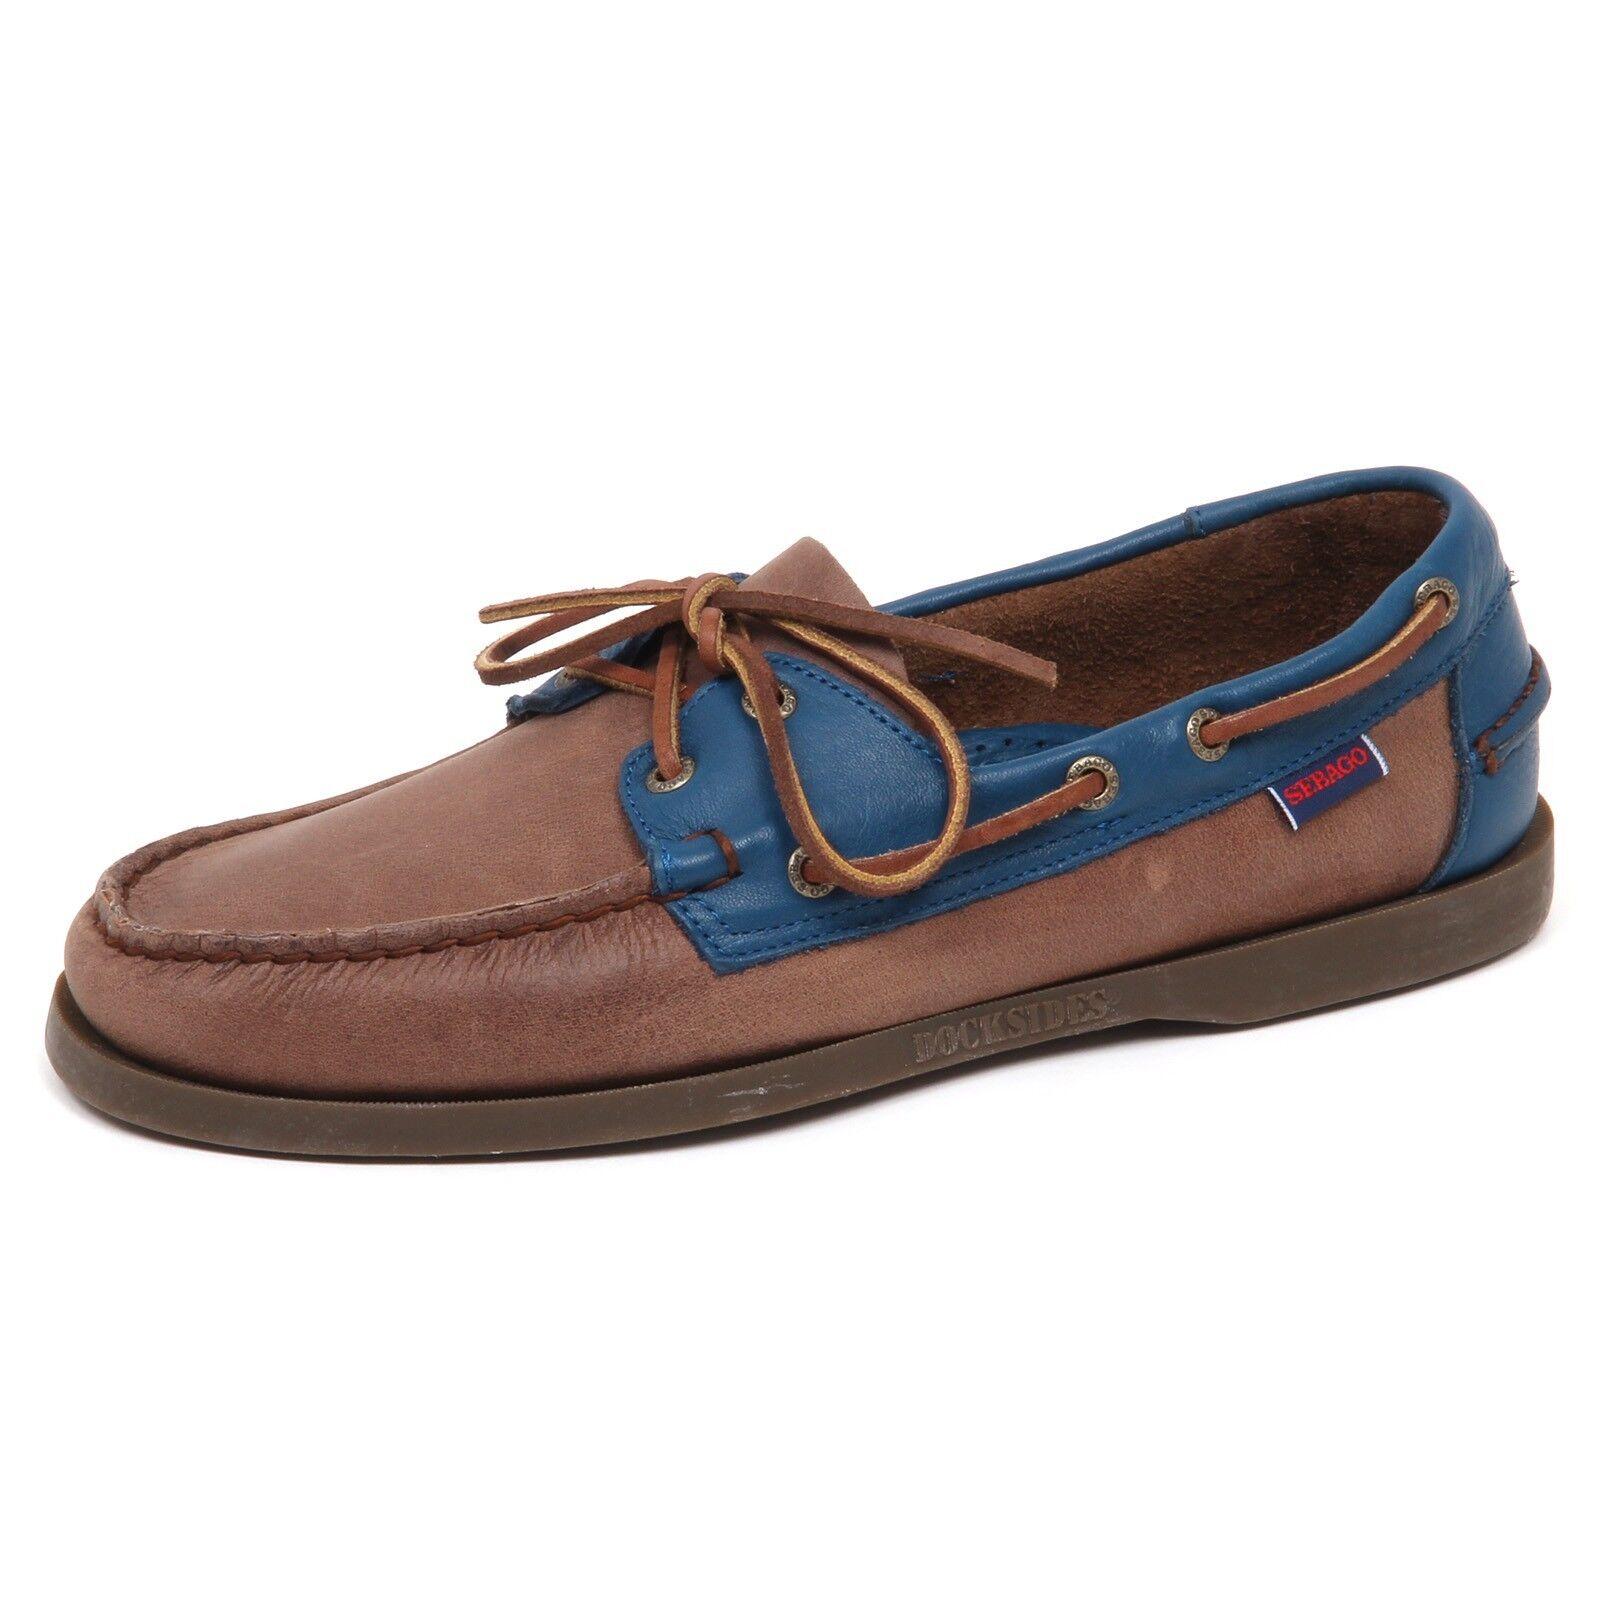 E0824 (SAMPLE WITHOUT BOX) mocassino uomo blu/brown SEBAGO vintage loafer man